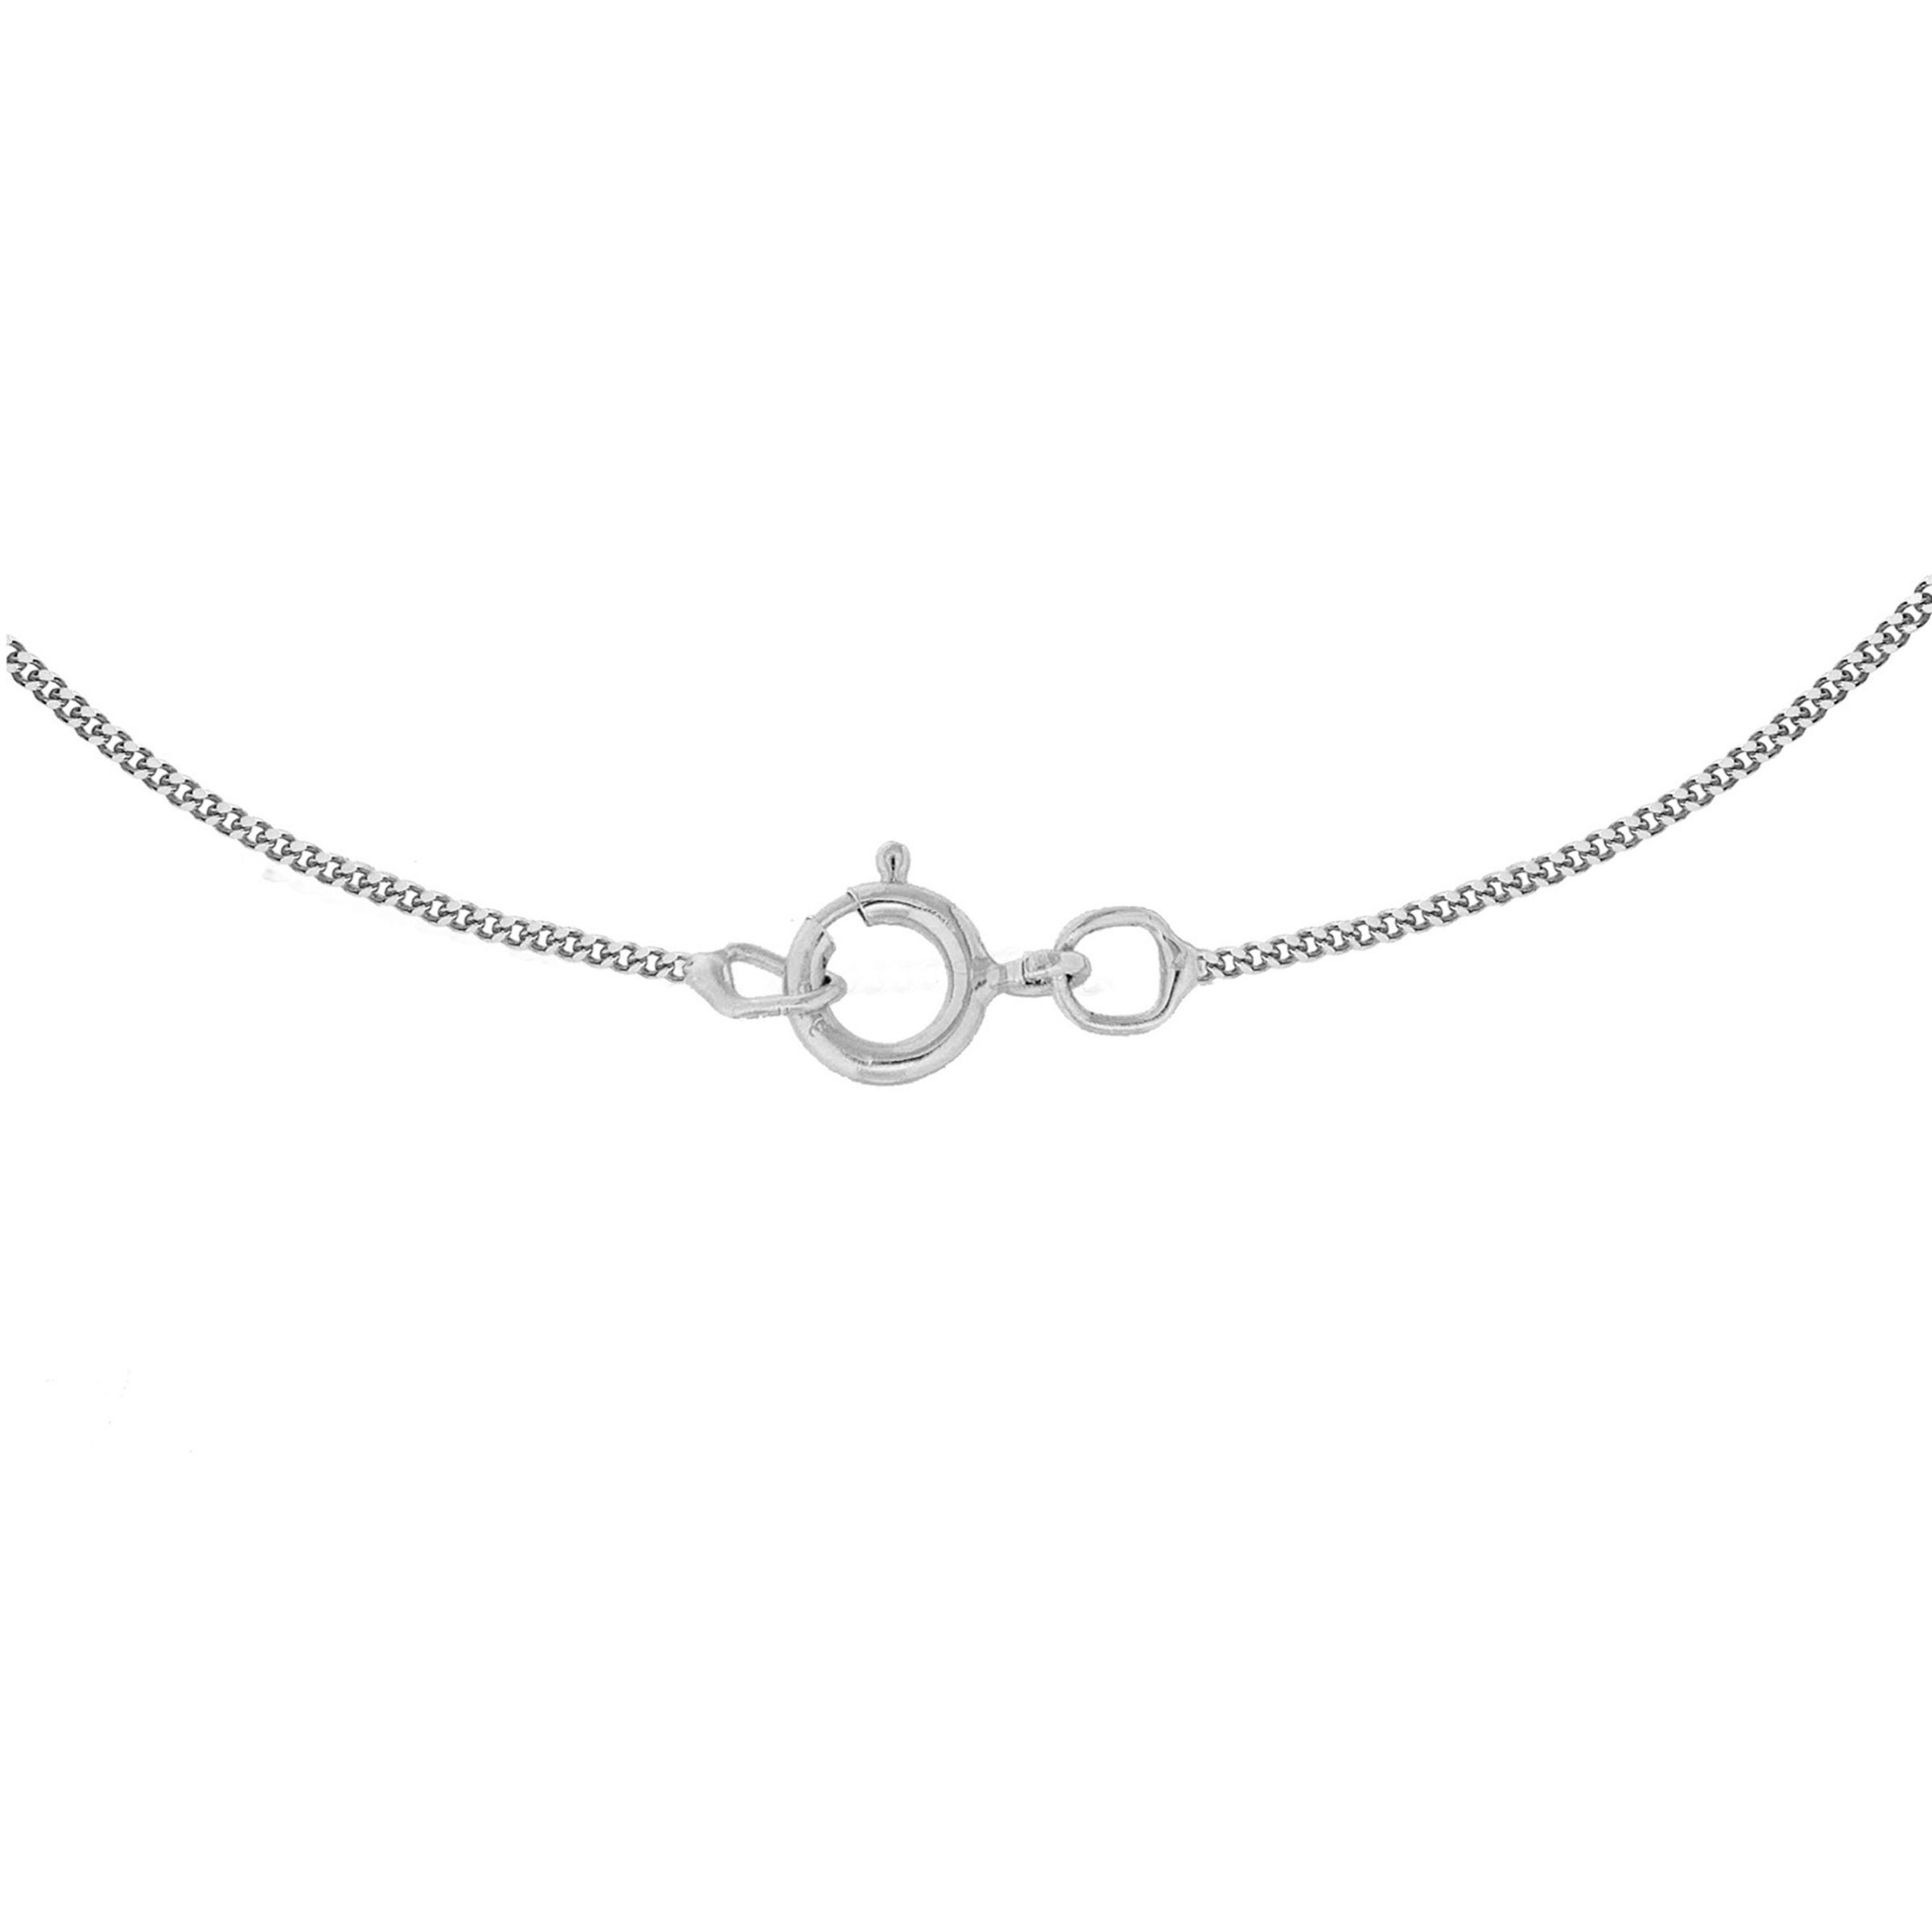 Ib&b 9ct Gold Knot Pendant in White Gold (Metallic)